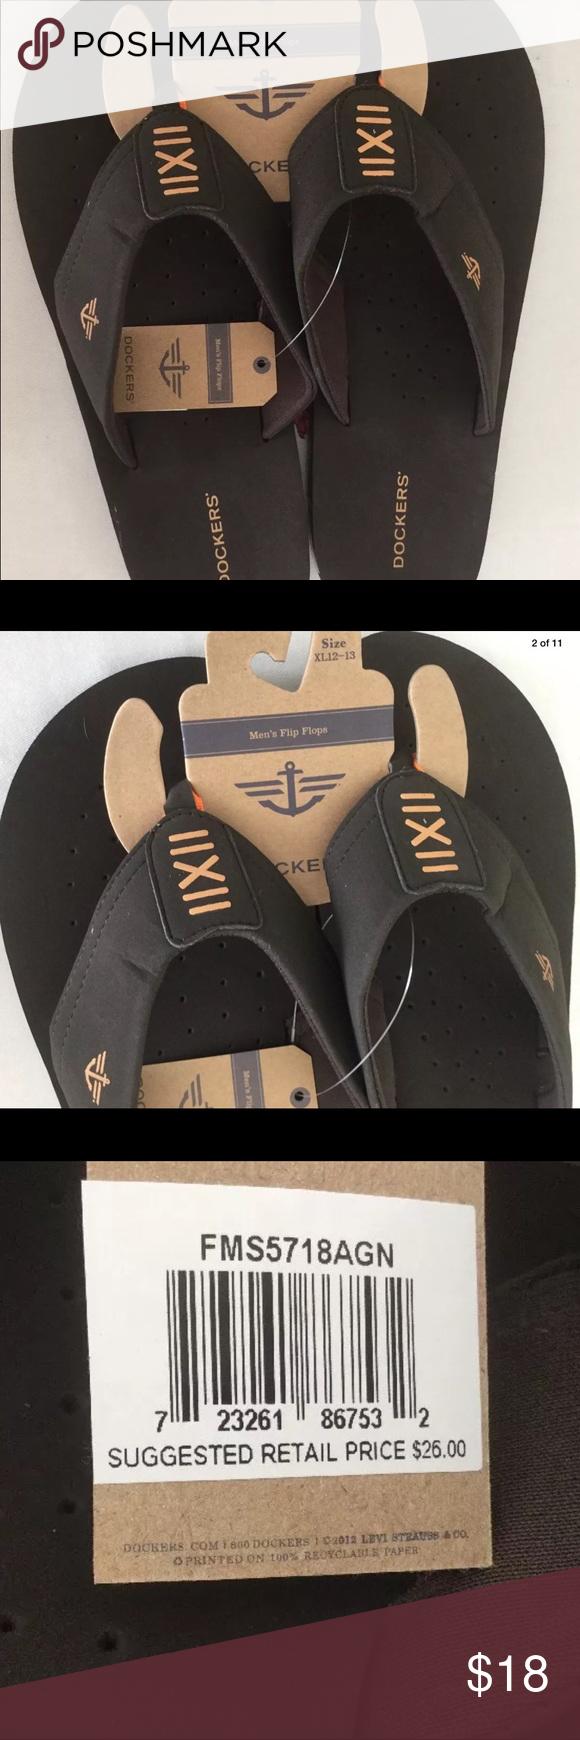 0f73c4b9e3b Men s DOCKERS Flip Flops Brown Sandals Sz XL New NWT